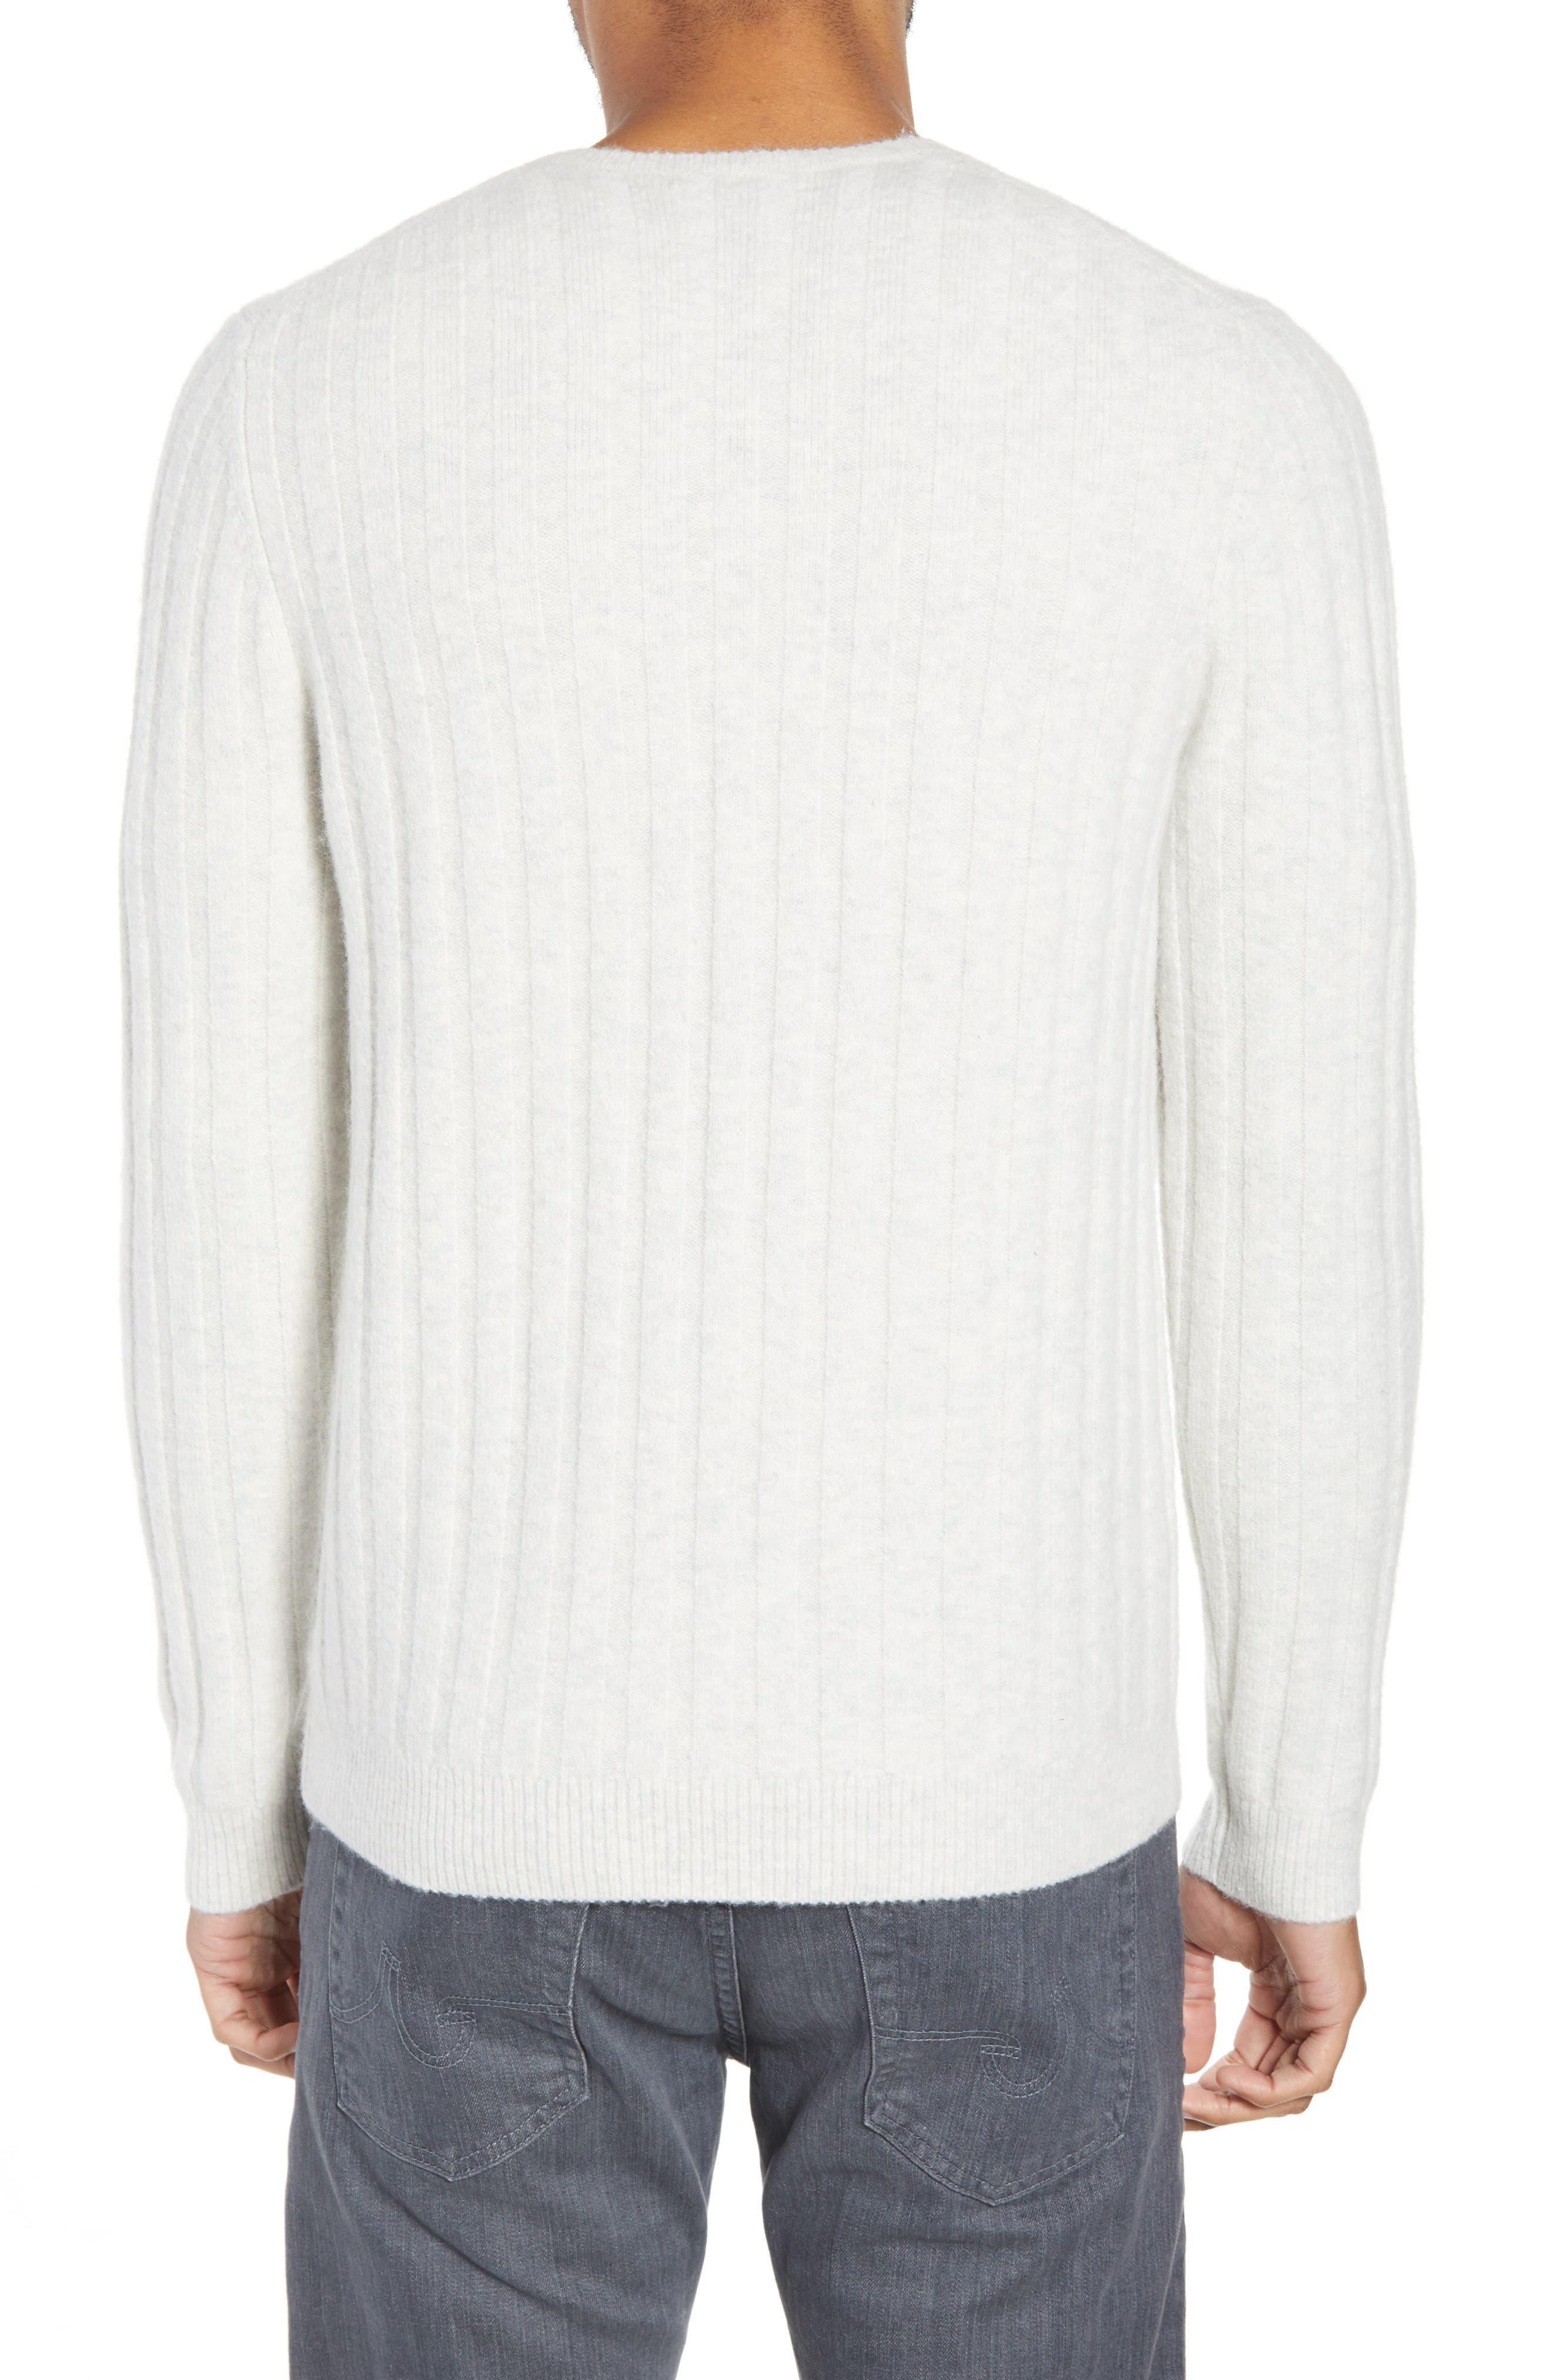 Rib Crewneck Sweater,                             Alternate thumbnail 2, color,                             GREY SILK HEATHER